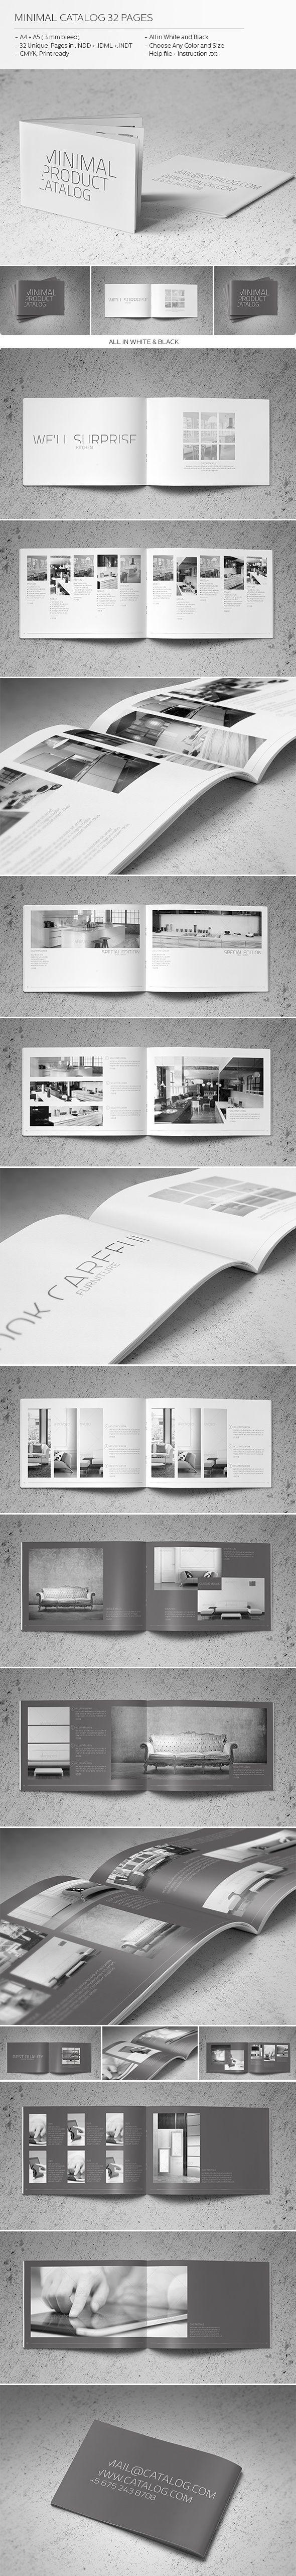 Minimal Catalog 32 P...@SeverousDu采集到设计 板式 画册(69图)_花瓣平面